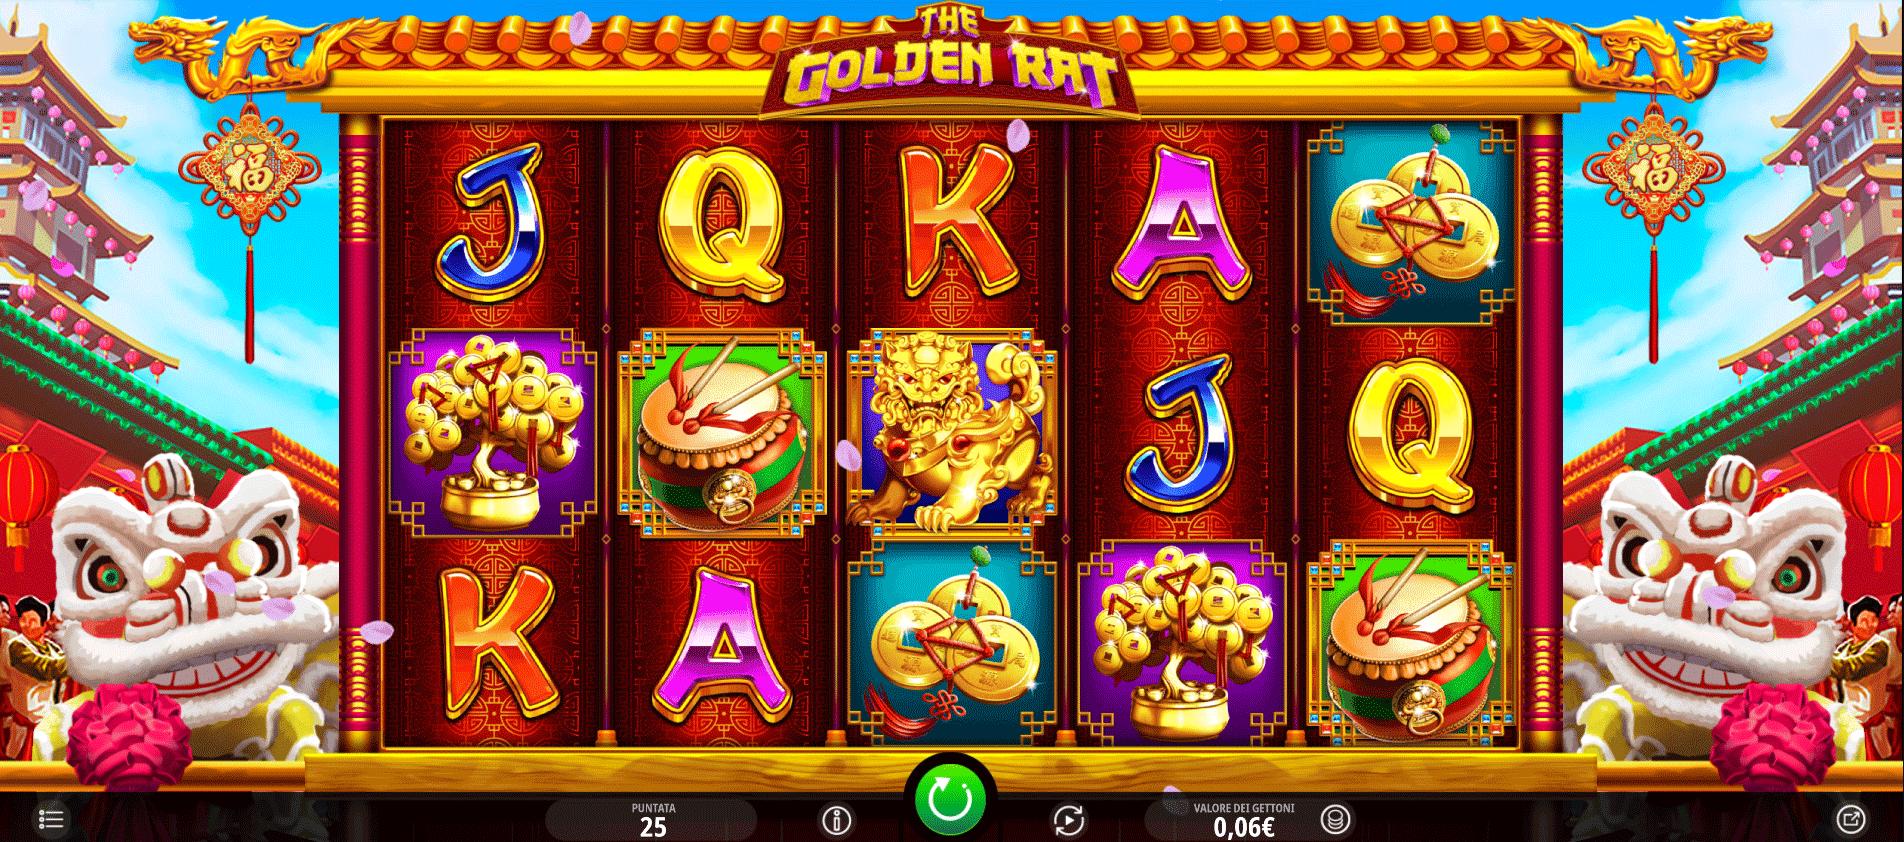 Slot The Golden Rat